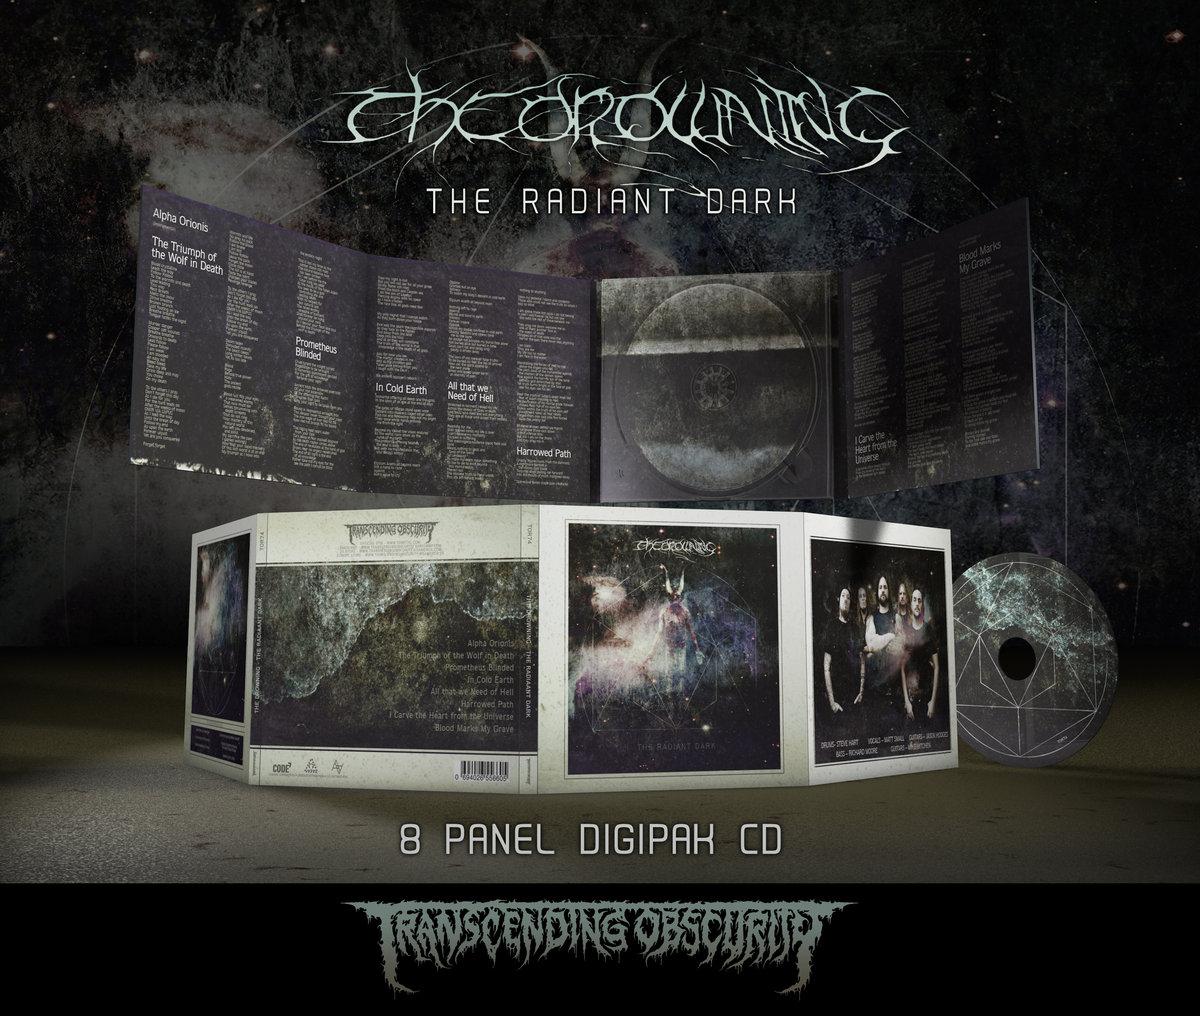 THE DROWNING (UK) - The Radiant Dark (Death / Doom Metal) 8-Panel Digipak  CD on Metallic Paper - TRANSCENDING OBSCURITY